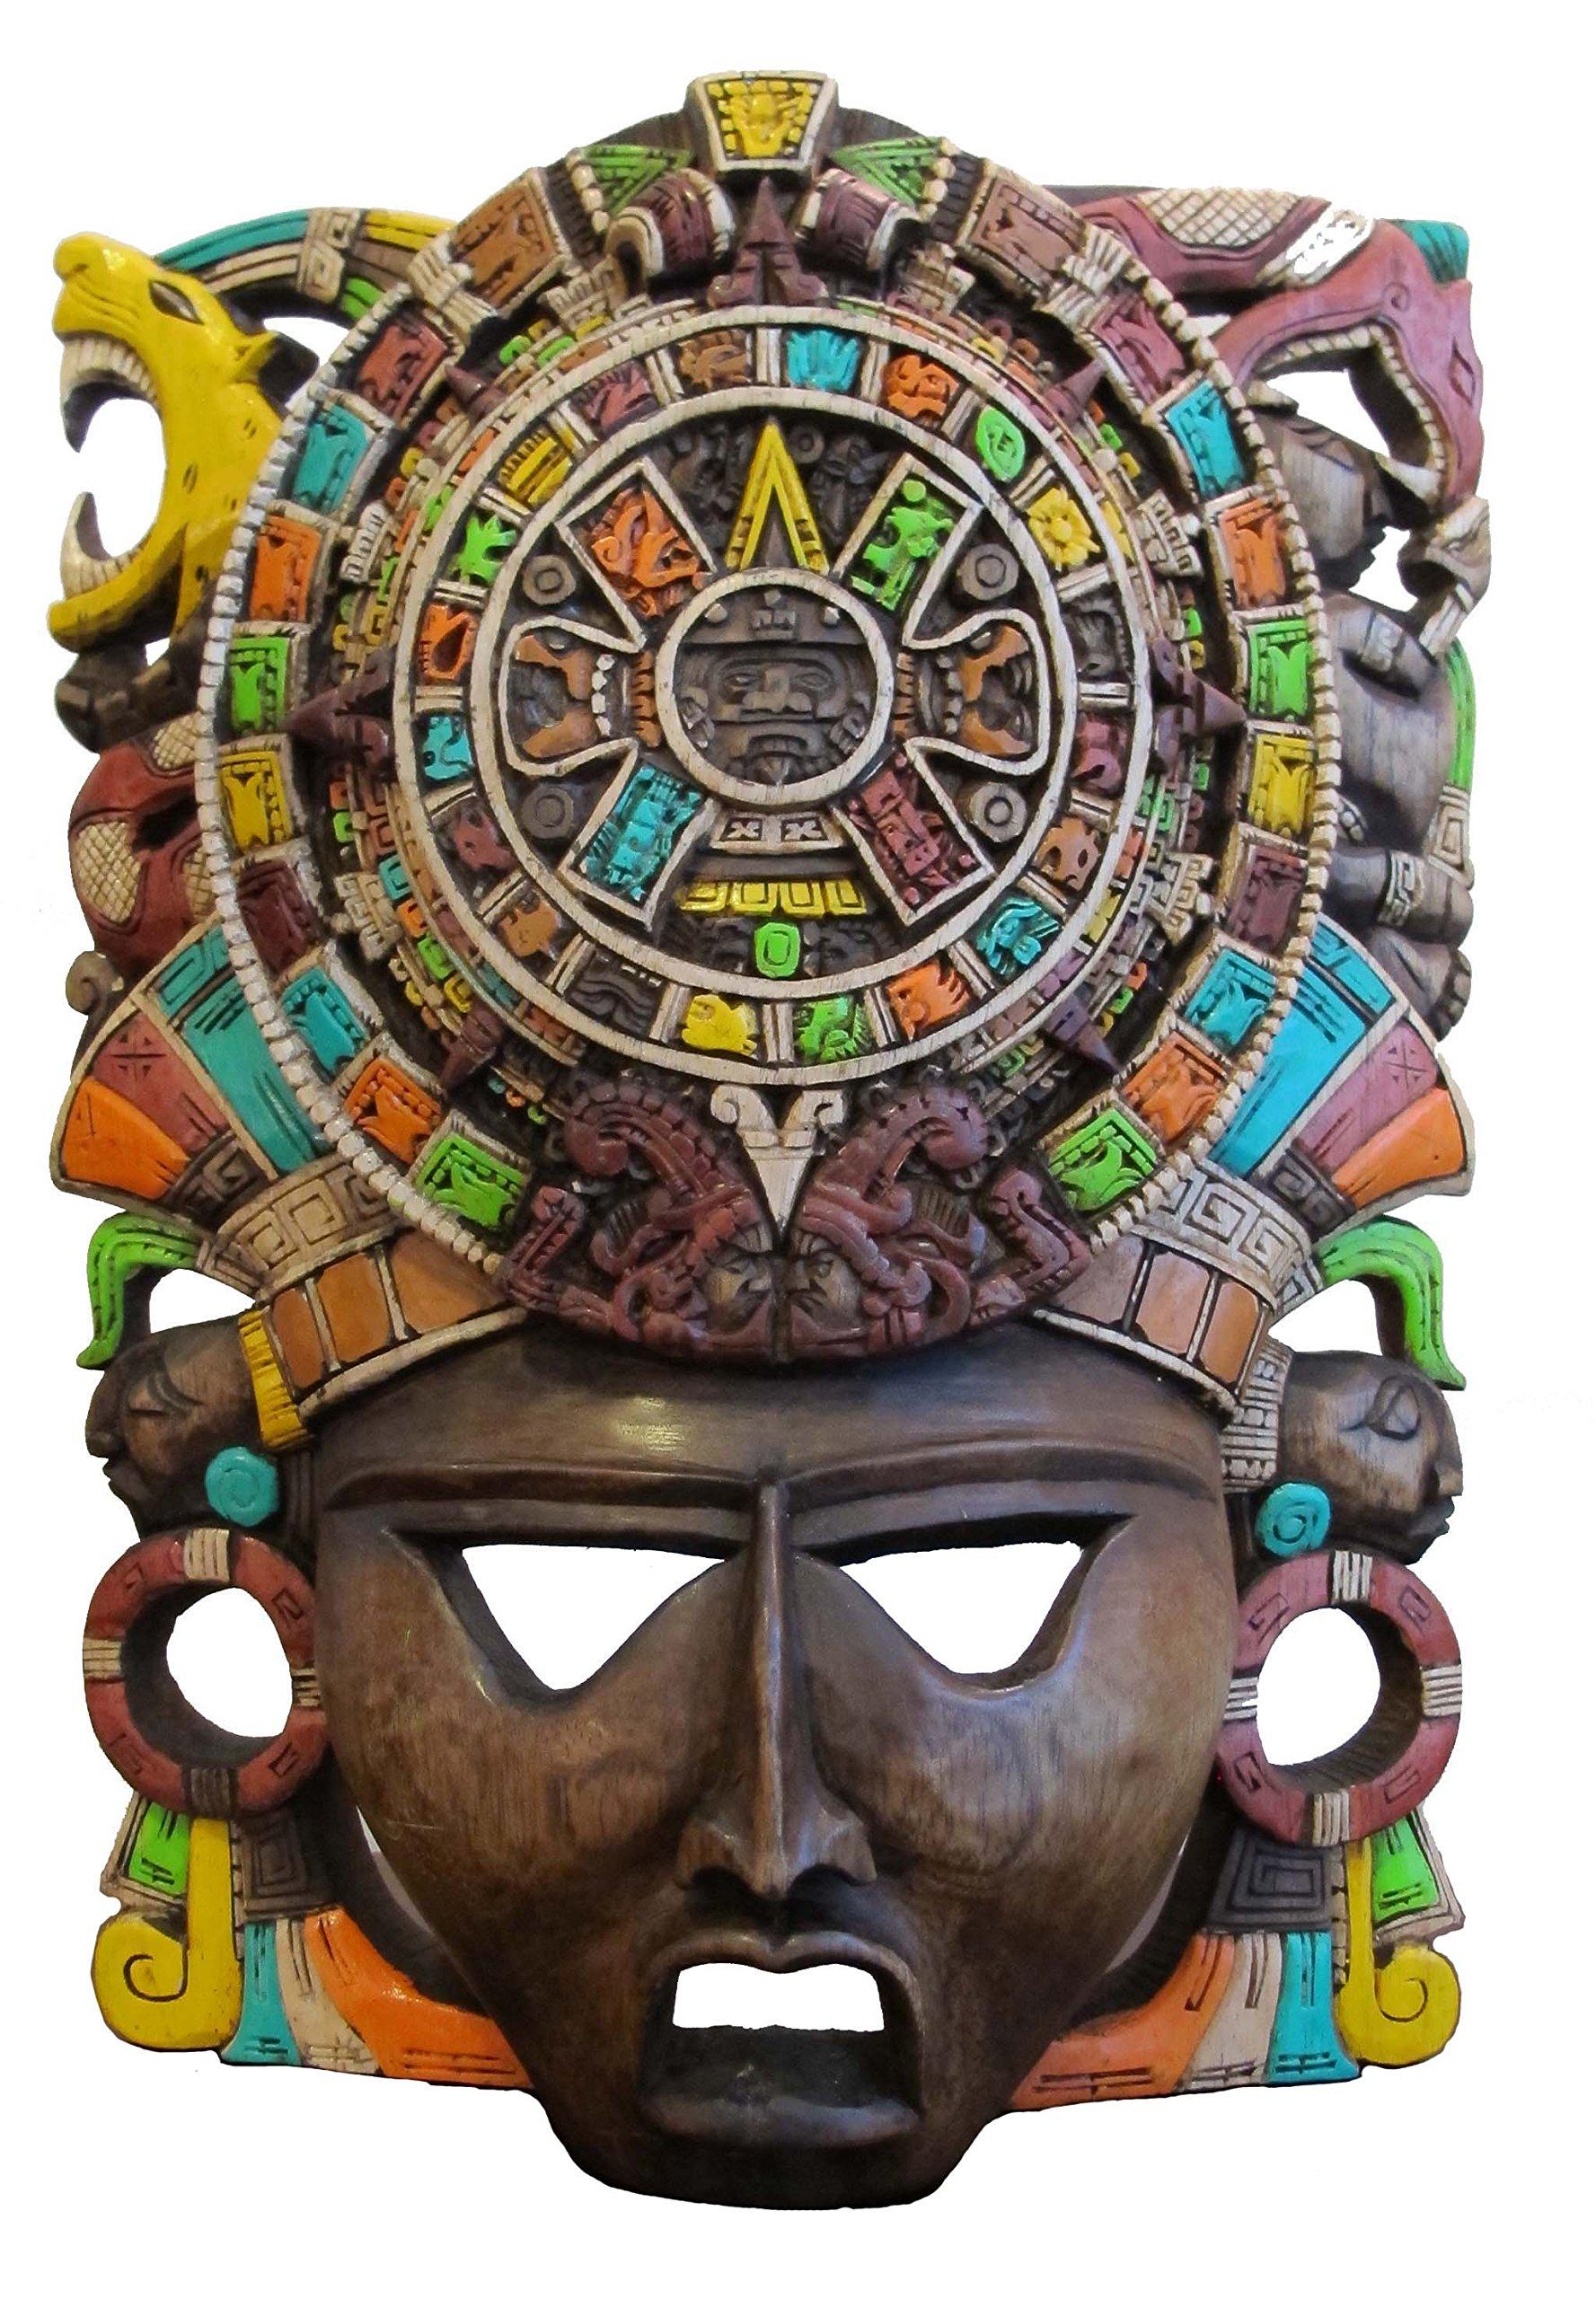 Sofia's Findings Mayan Mask - Aztec CalendarPremium Craft